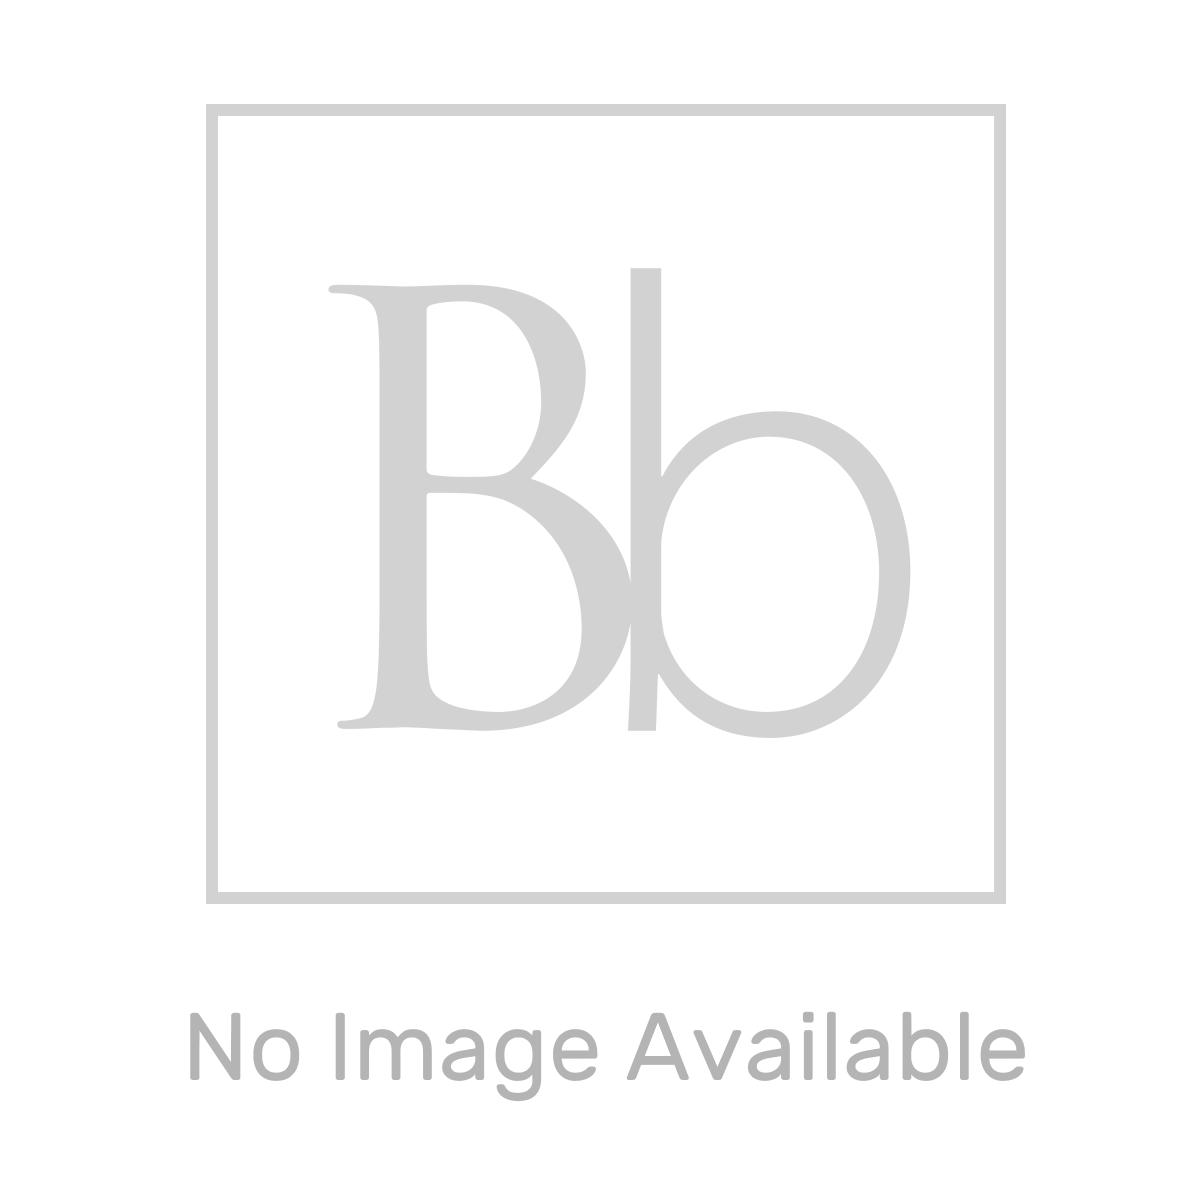 Premier Vault Stone Grey Compact Vanity Unit 400mm